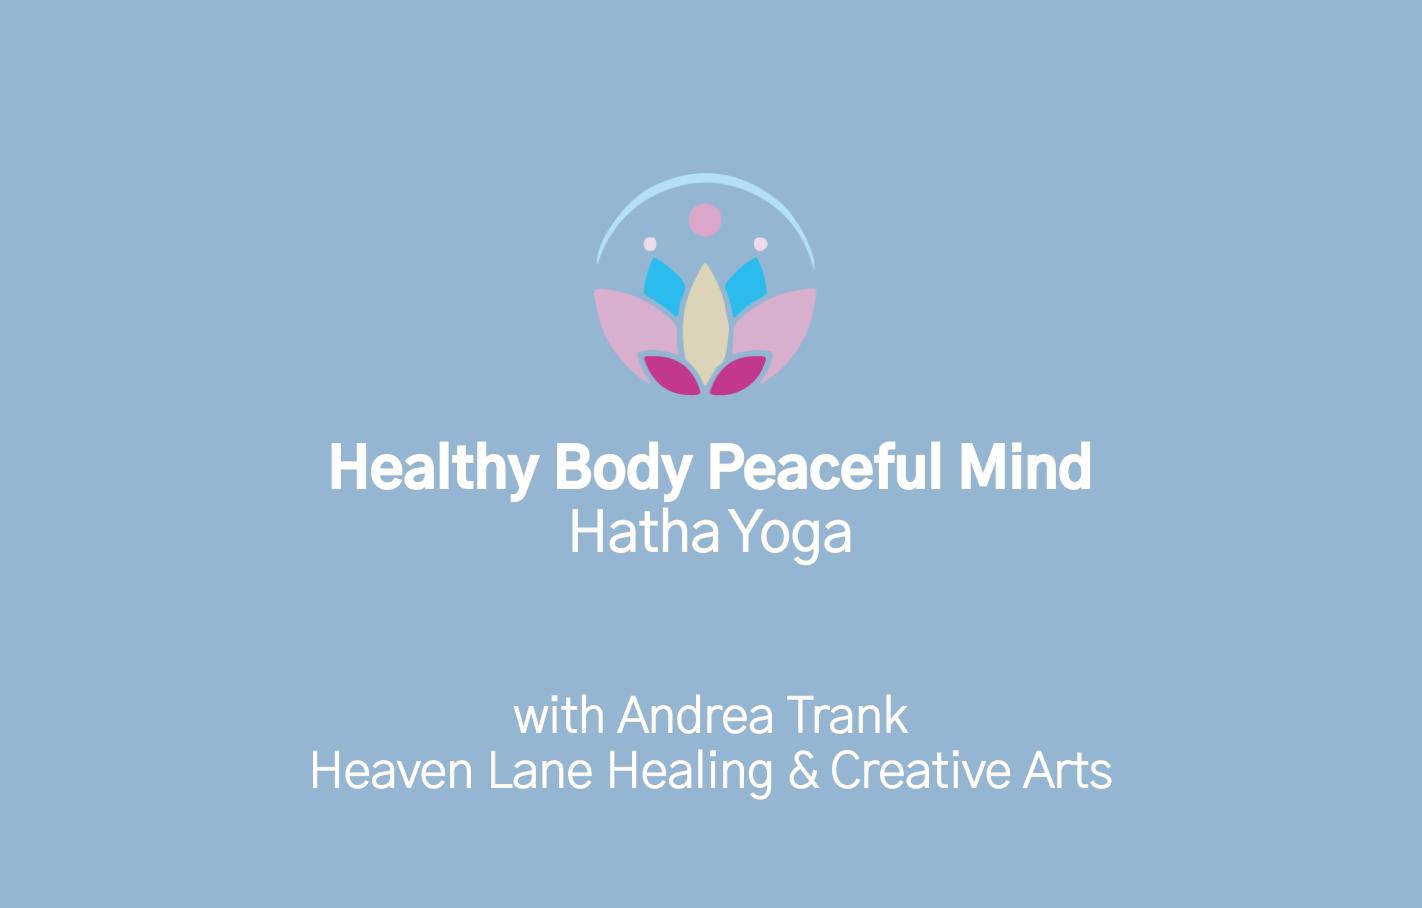 3. Hatha Yoga